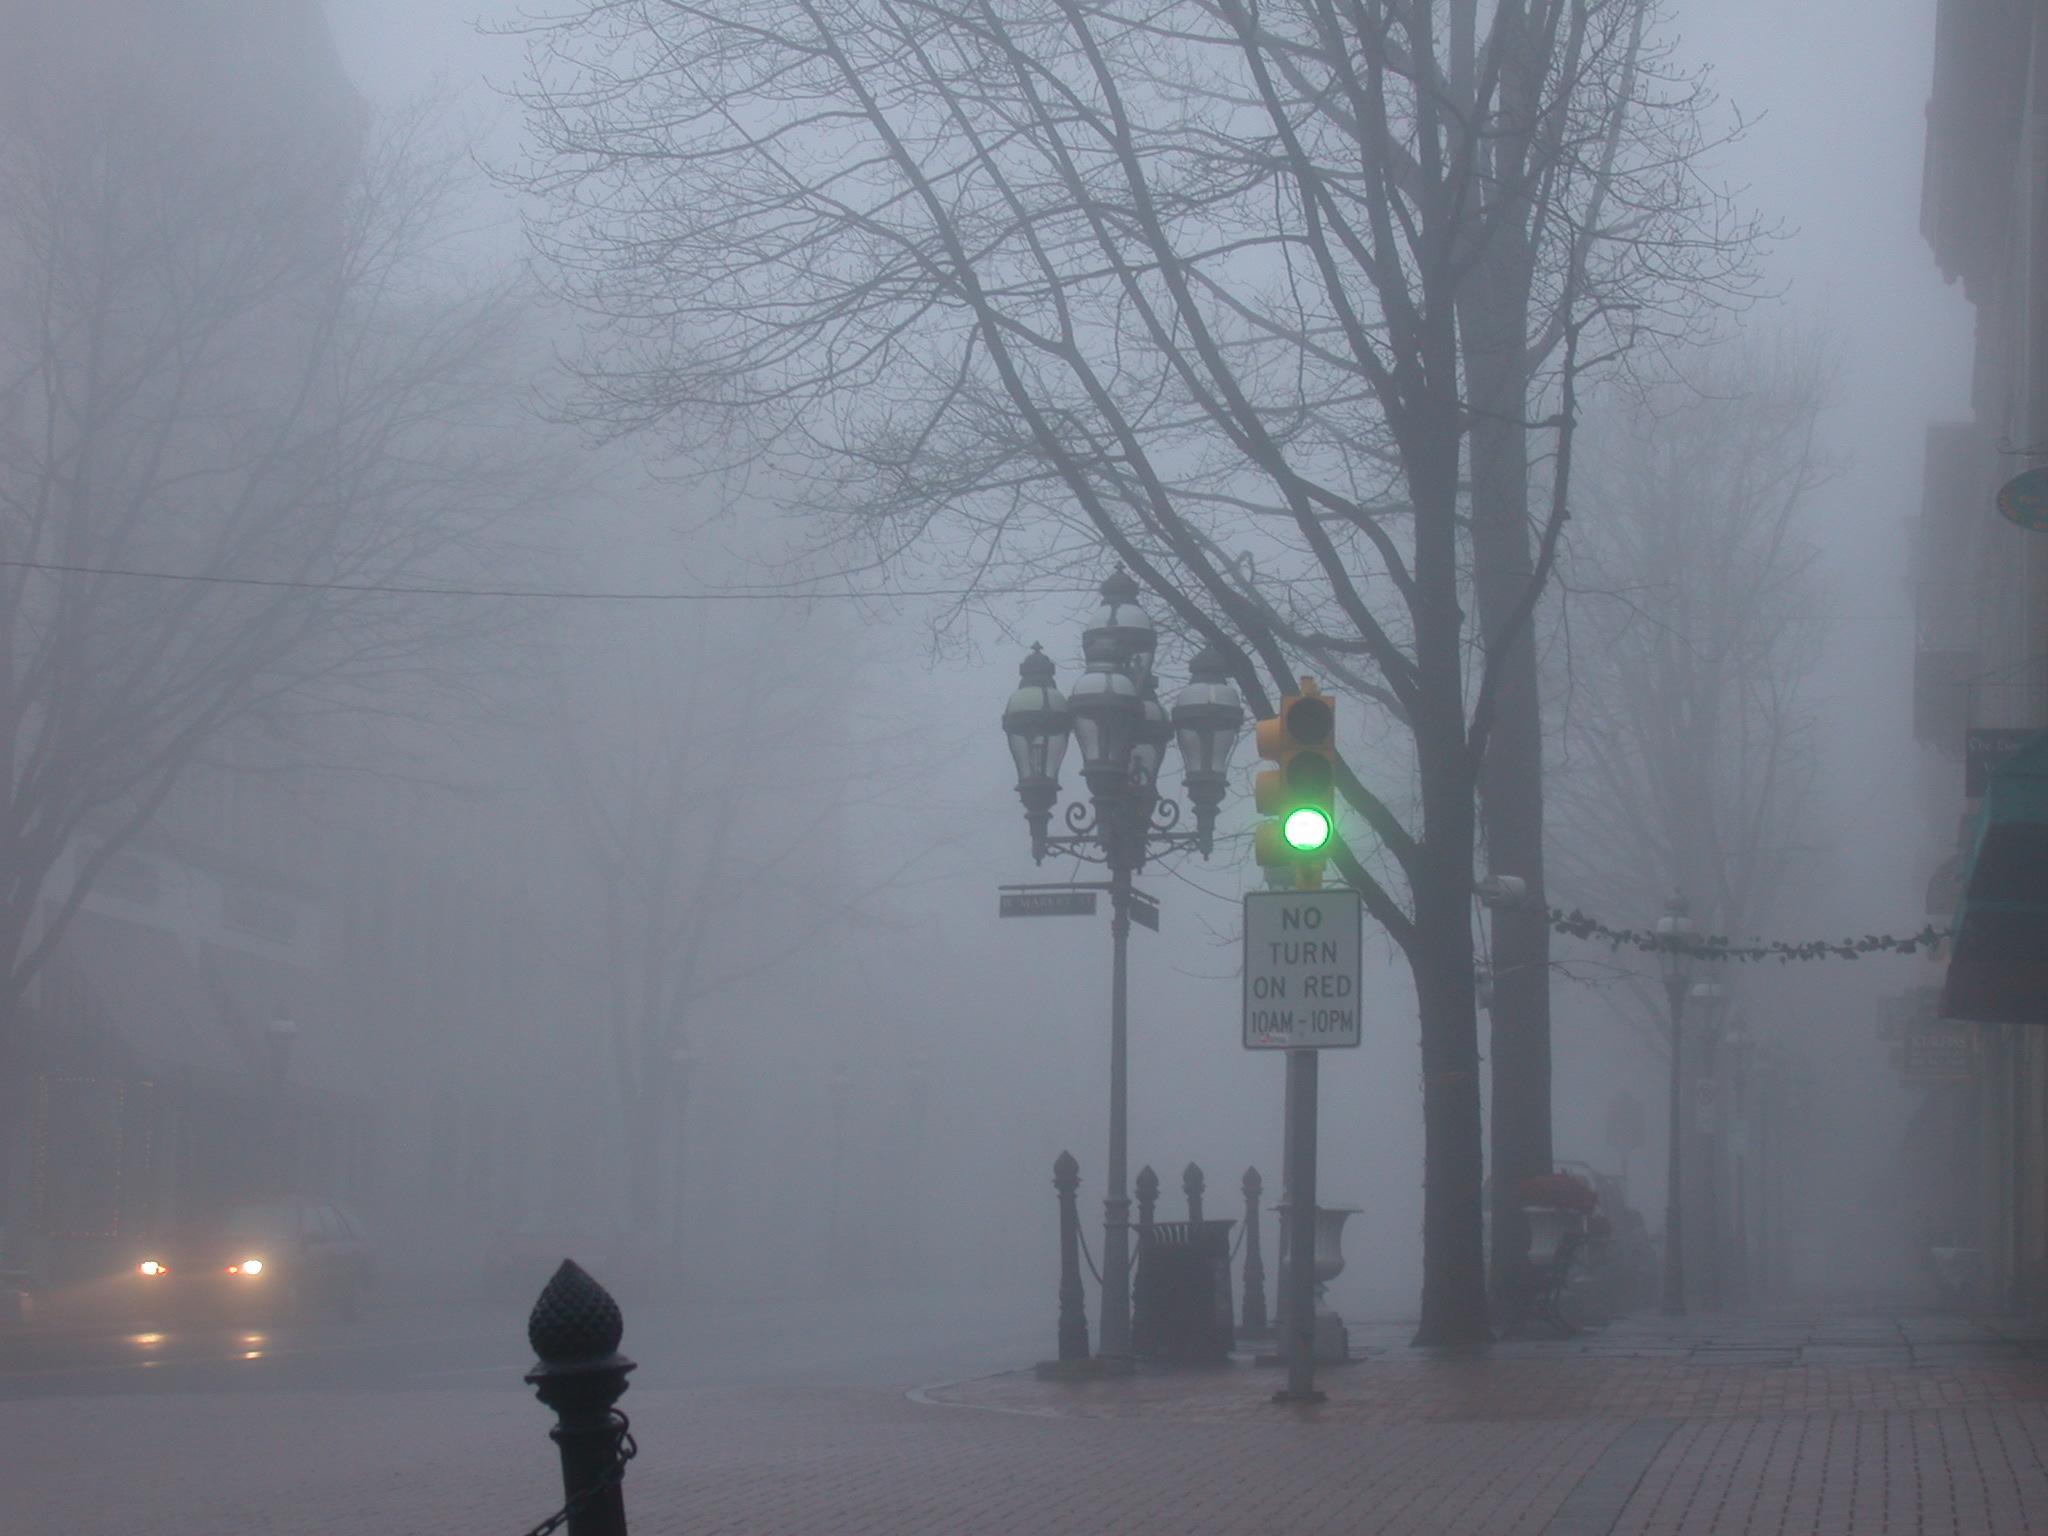 City Wallpaper Iphone Foggy Wallpaper 2048x1536 68545